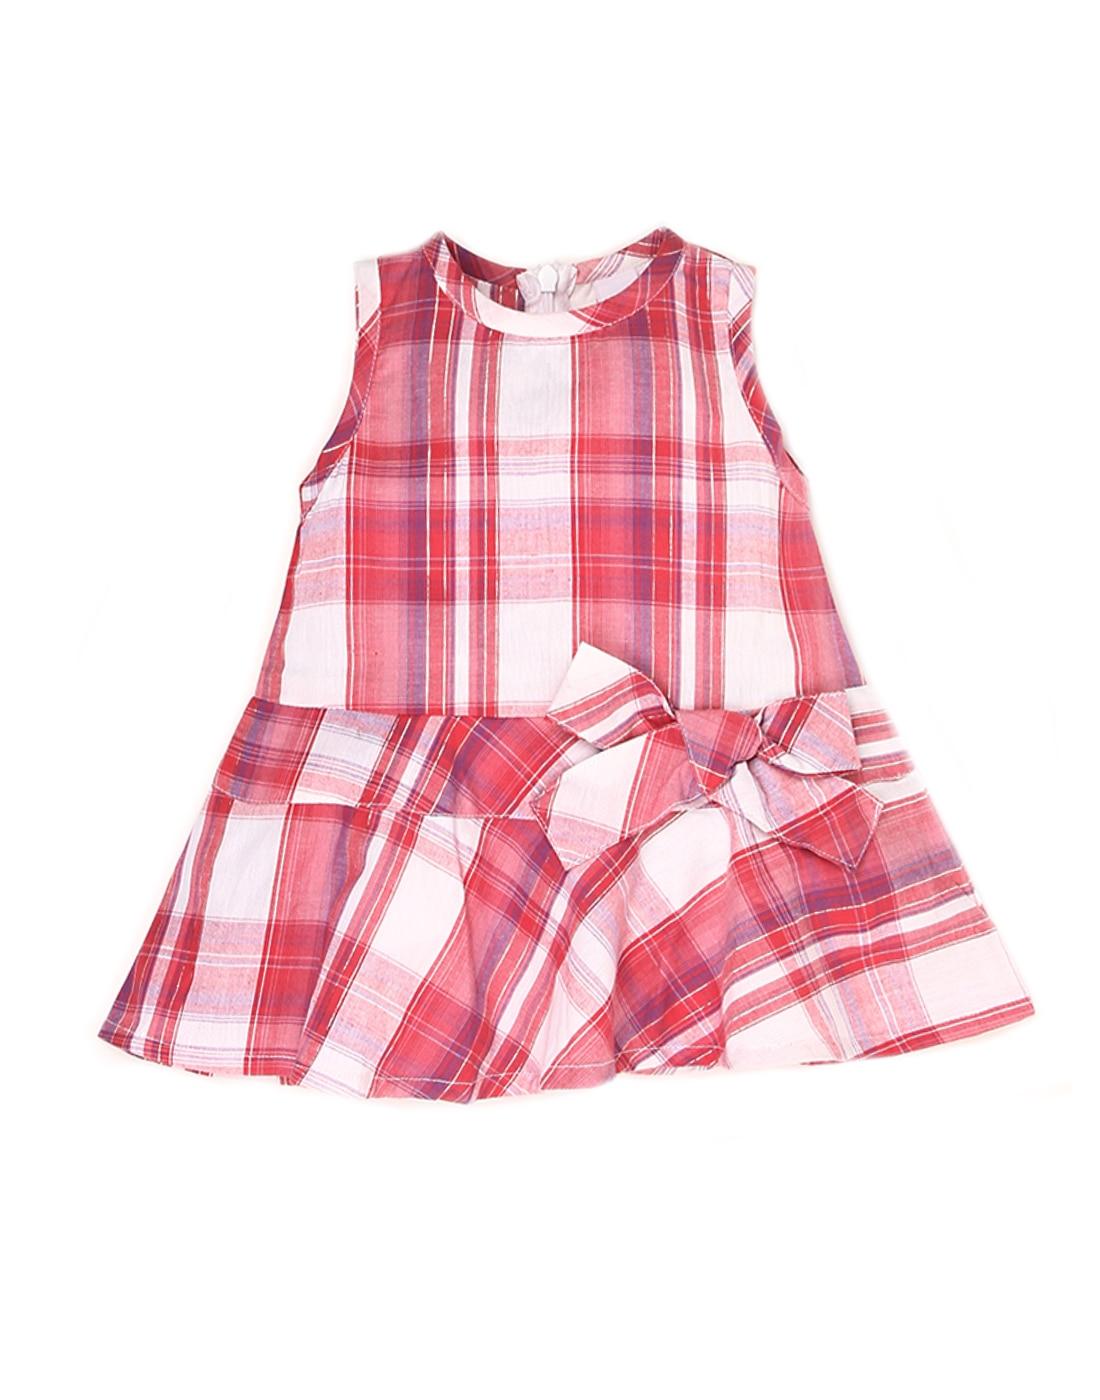 K.C.O 89 Baby Girls Pink Checkered Dress